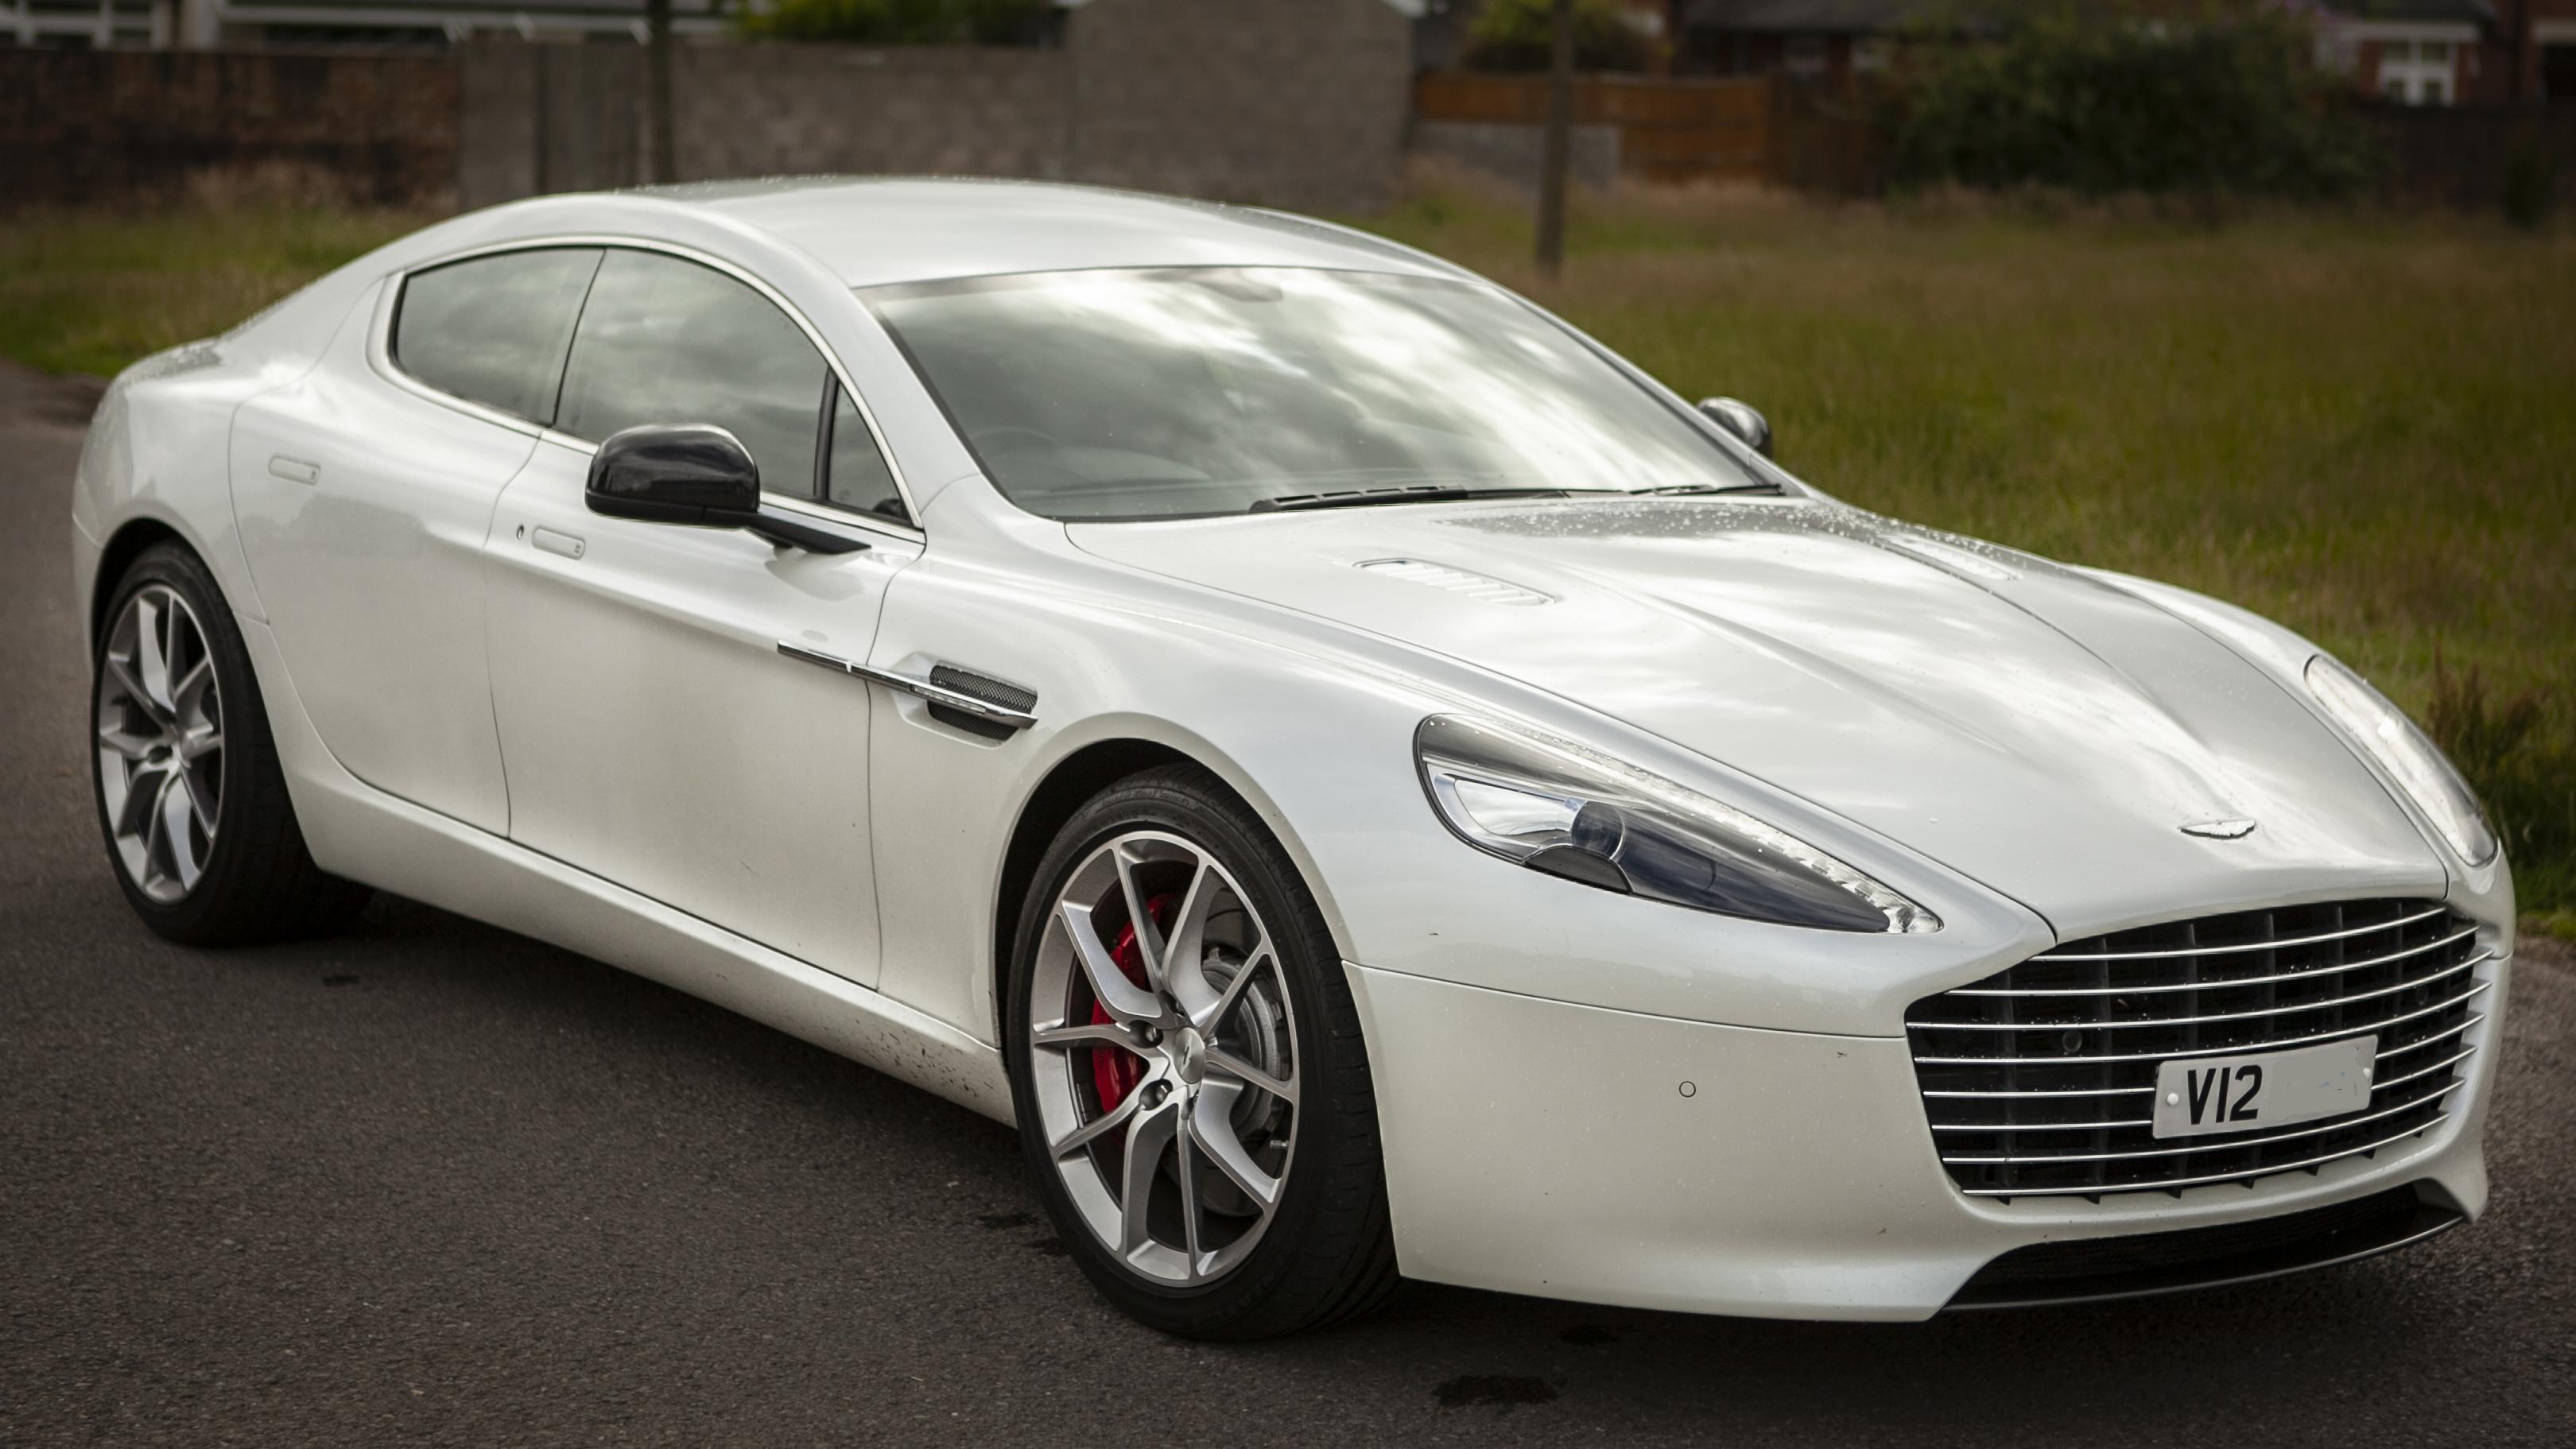 Aston Martin V12 Rapide 'S'